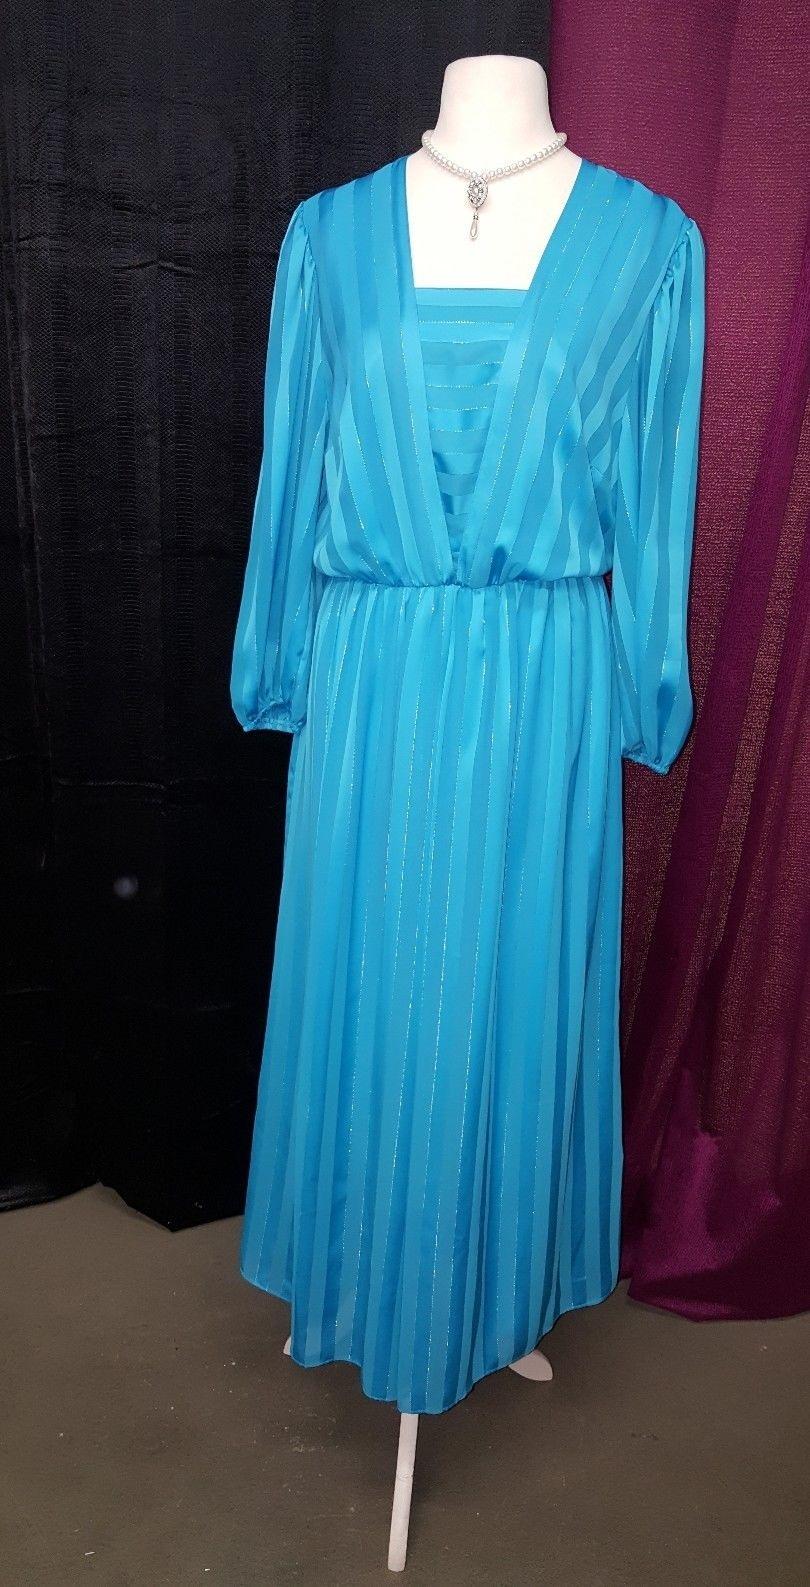 15 Großartig Abendkleid 40 Bester Preis20 Genial Abendkleid 40 Boutique